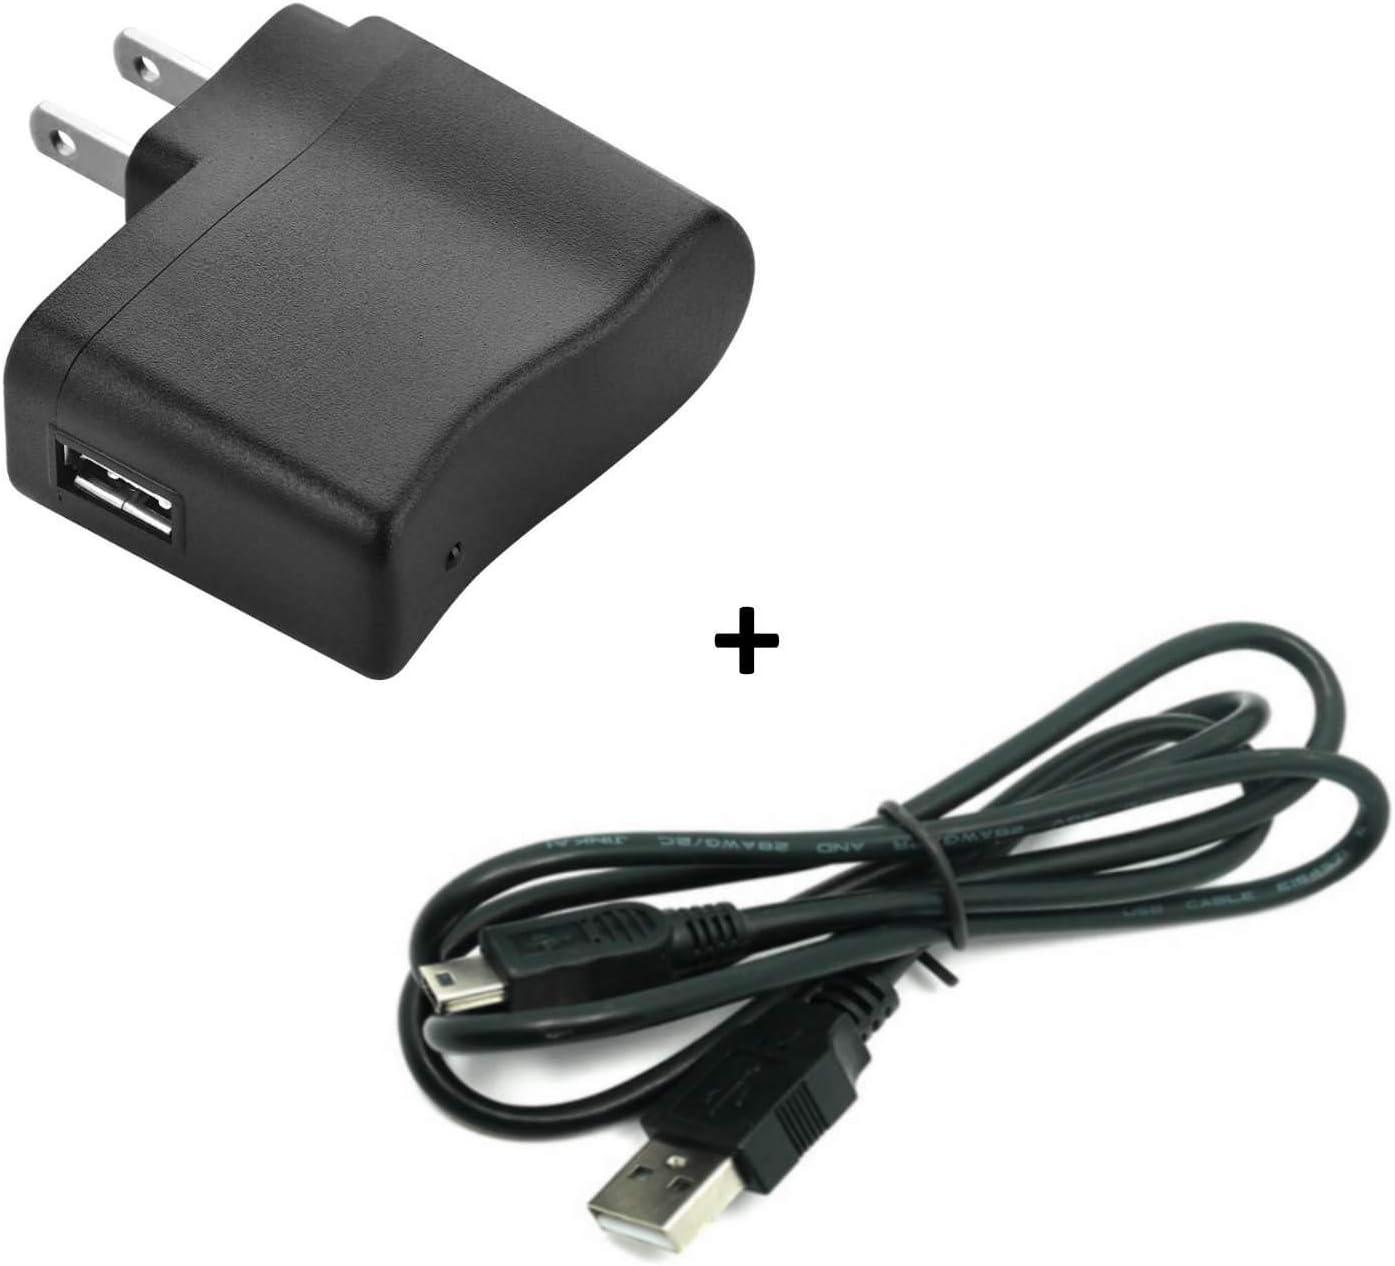 USB Power//Data Cable /& Wall AC Adapter for Texas Instruments Calculators TI-84 Plus TI-84 Plus C Silver Edition TI 89 Titanium TI Nspire CX TI Nspire CX CAS Graphing Calculator Charger